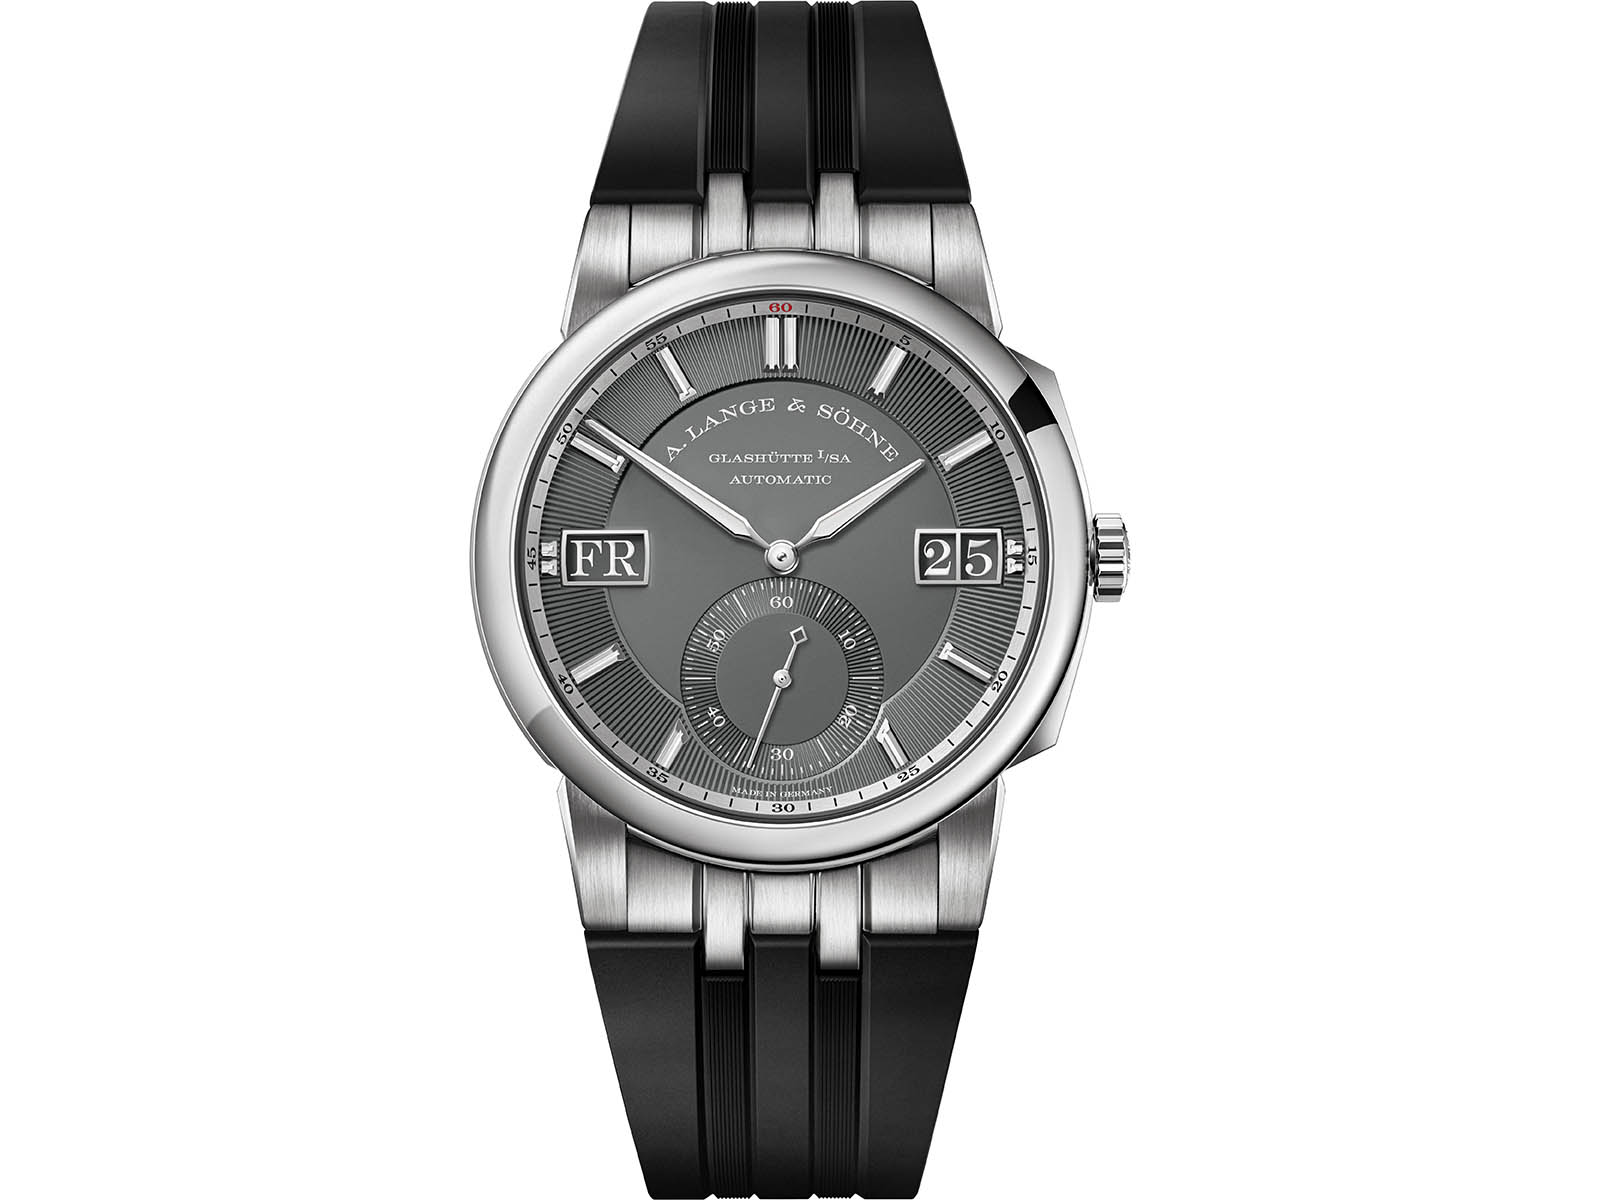 363-068-a-lange-sohne-odysseus-watch-wonders-2020-1.jpg